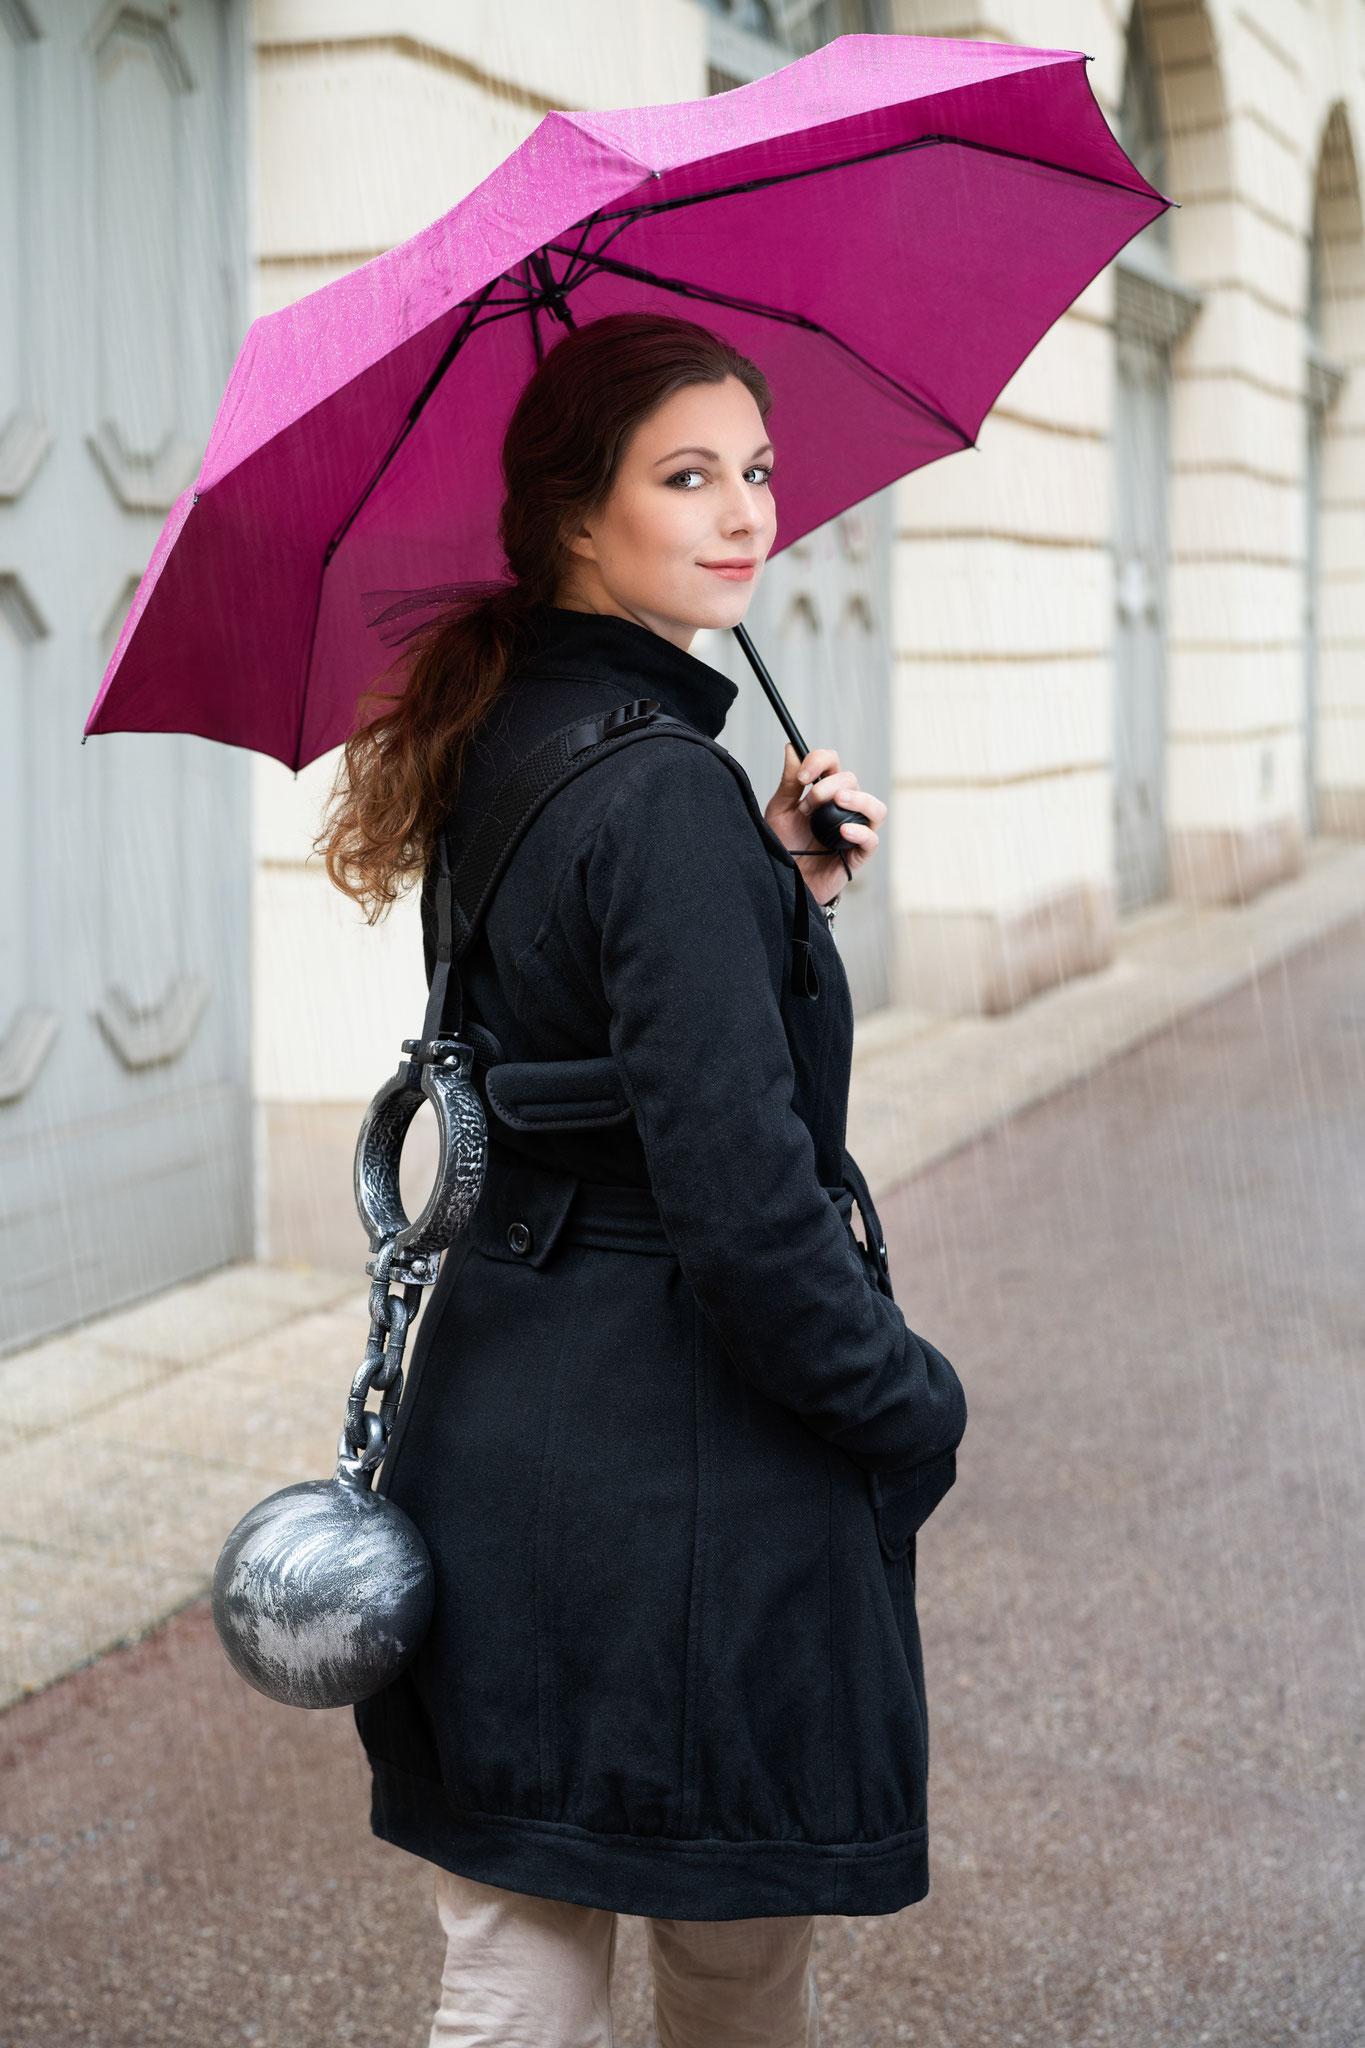 LATISSIMA - Gerade bei Regen…